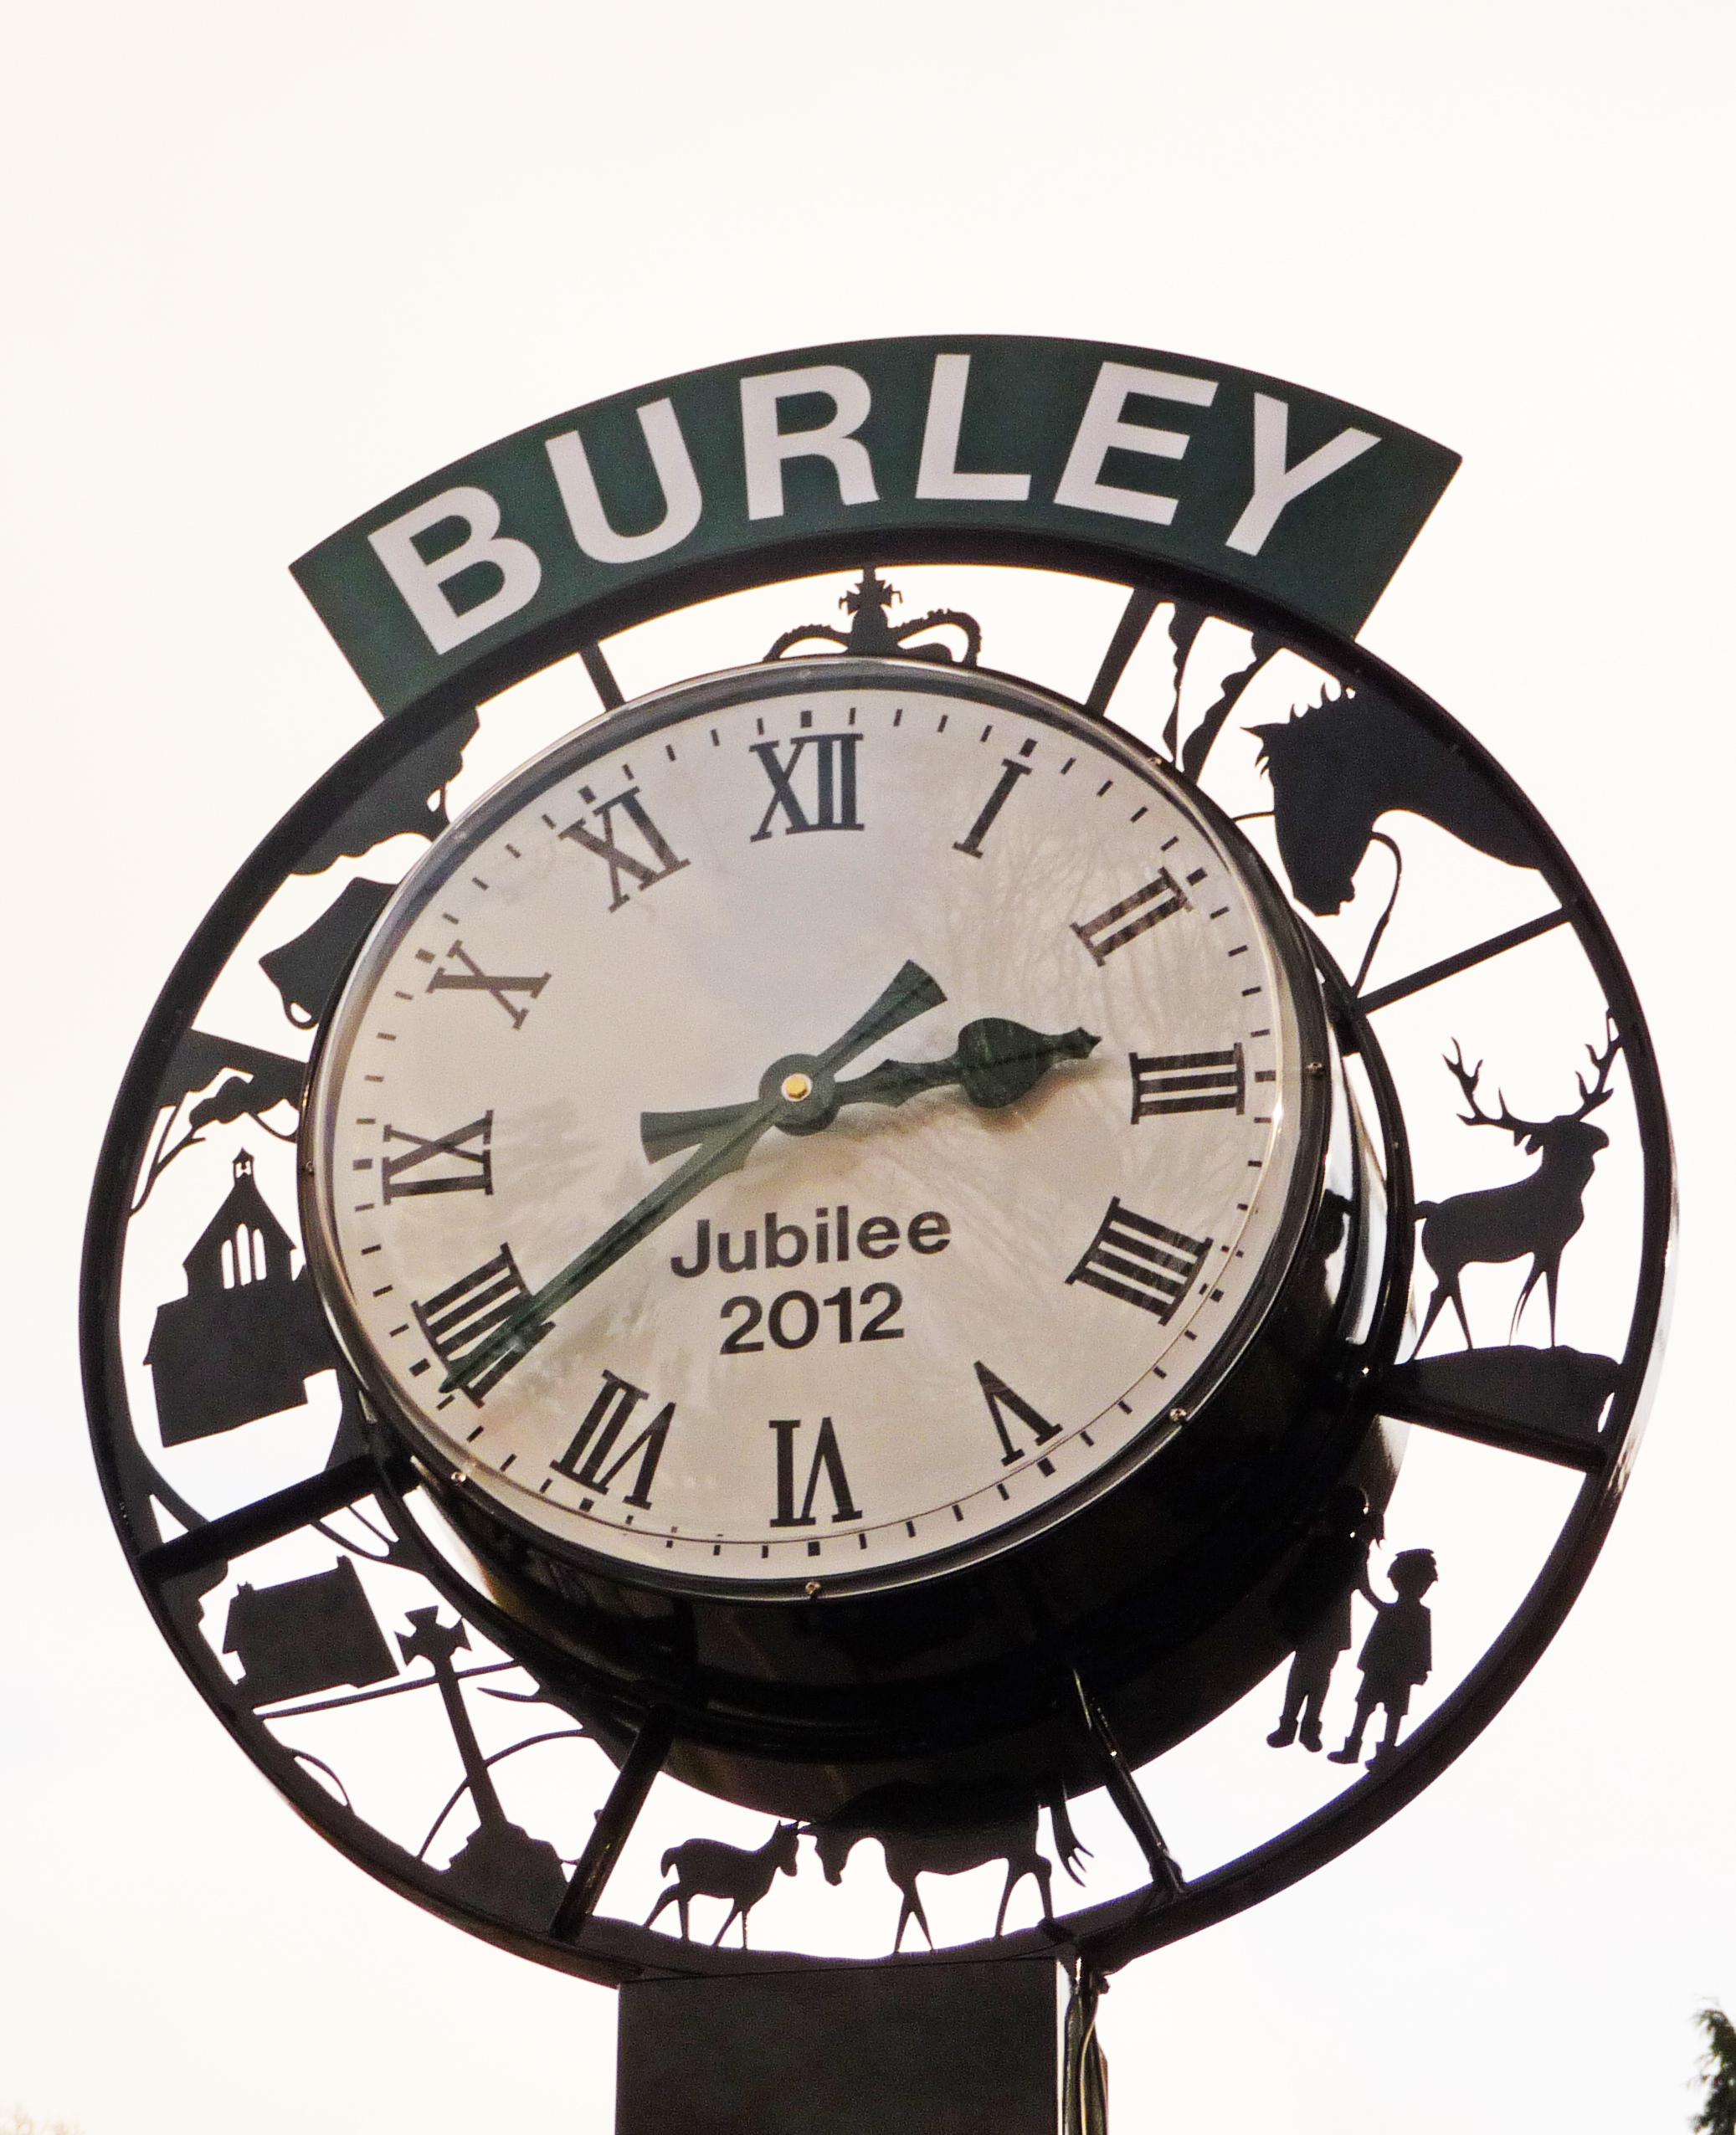 Signage on Pillar Clock